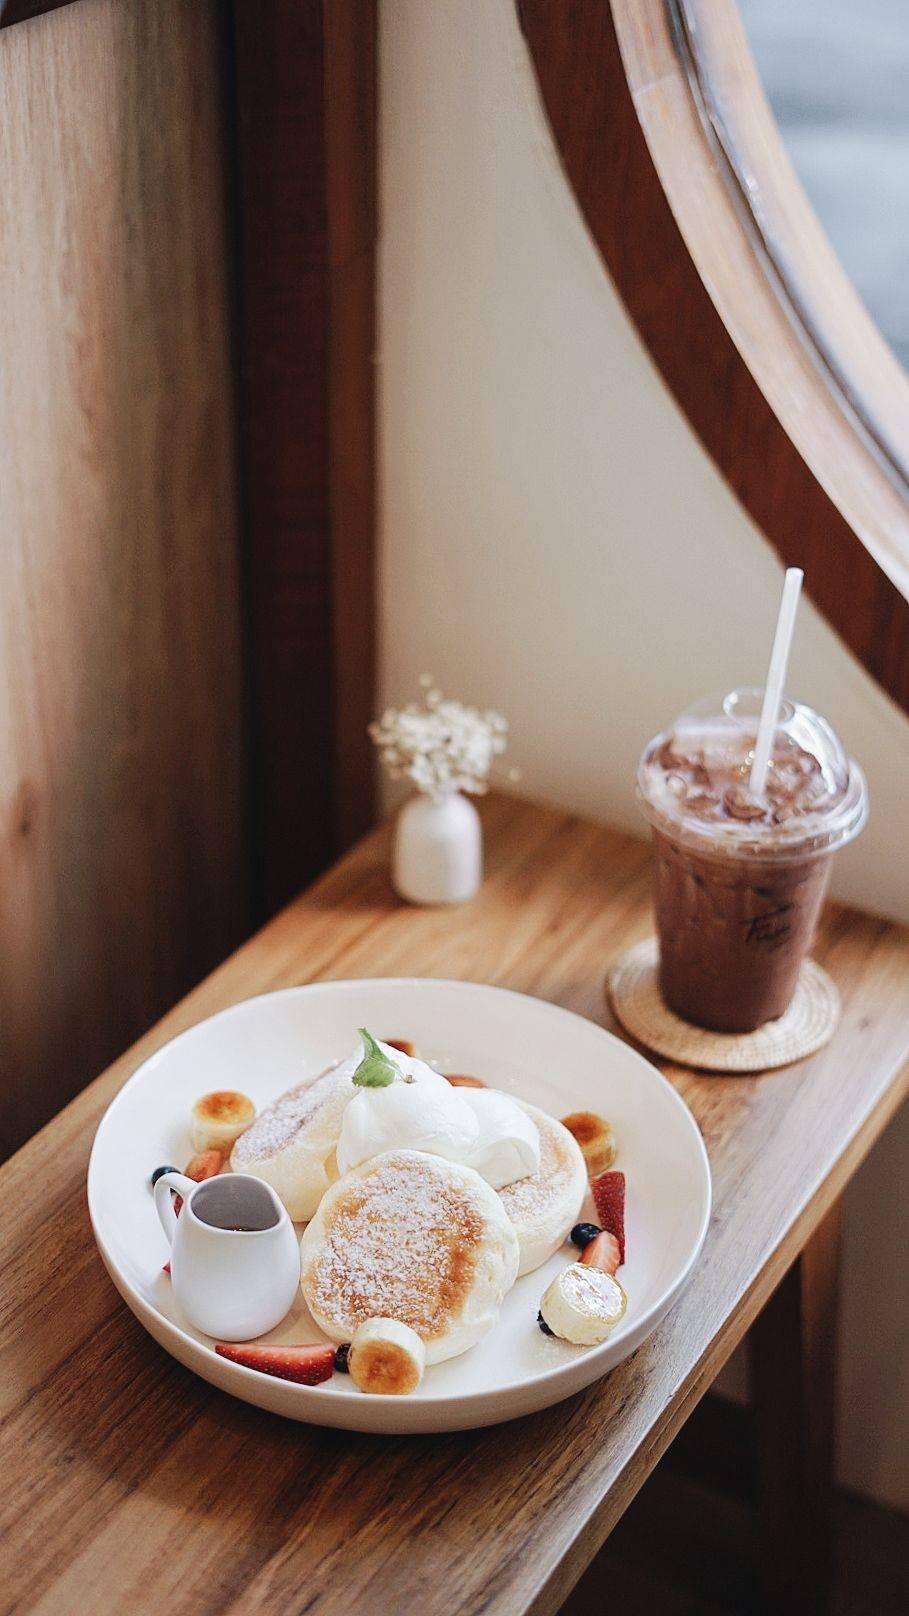 Fuu.soufflepancake กัมพ์ อารีย์